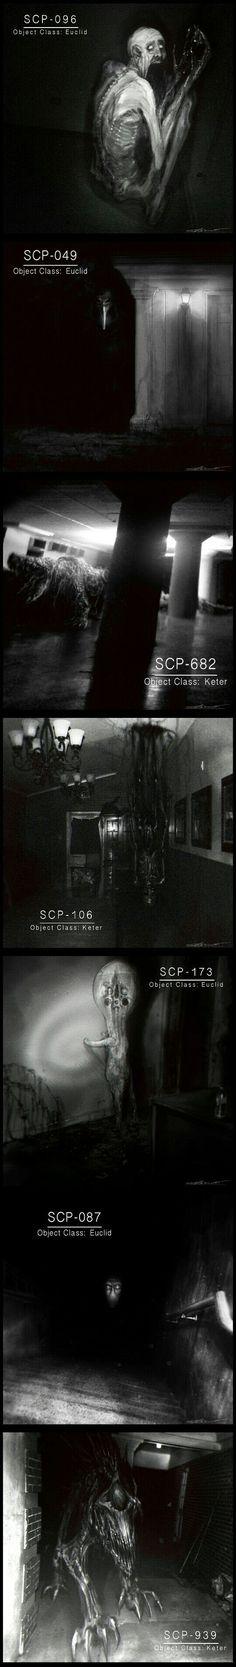 Creepy SCP monsters by Cinemamind - Gaming